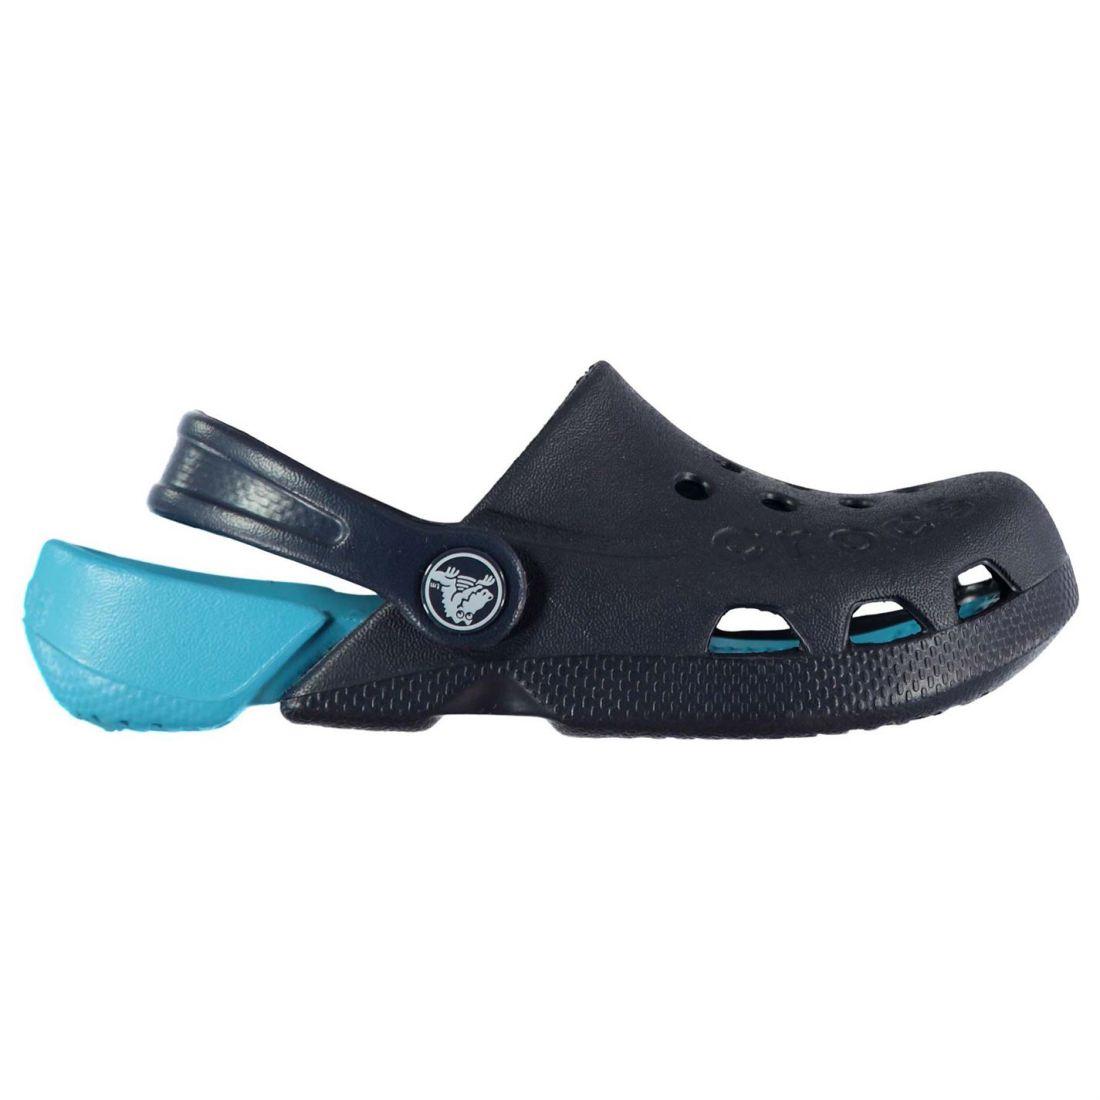 f3986db7d42c0 Crocs Baby Electro Clogs Shoes Unisex Kids Mules Slippers Sandals ...